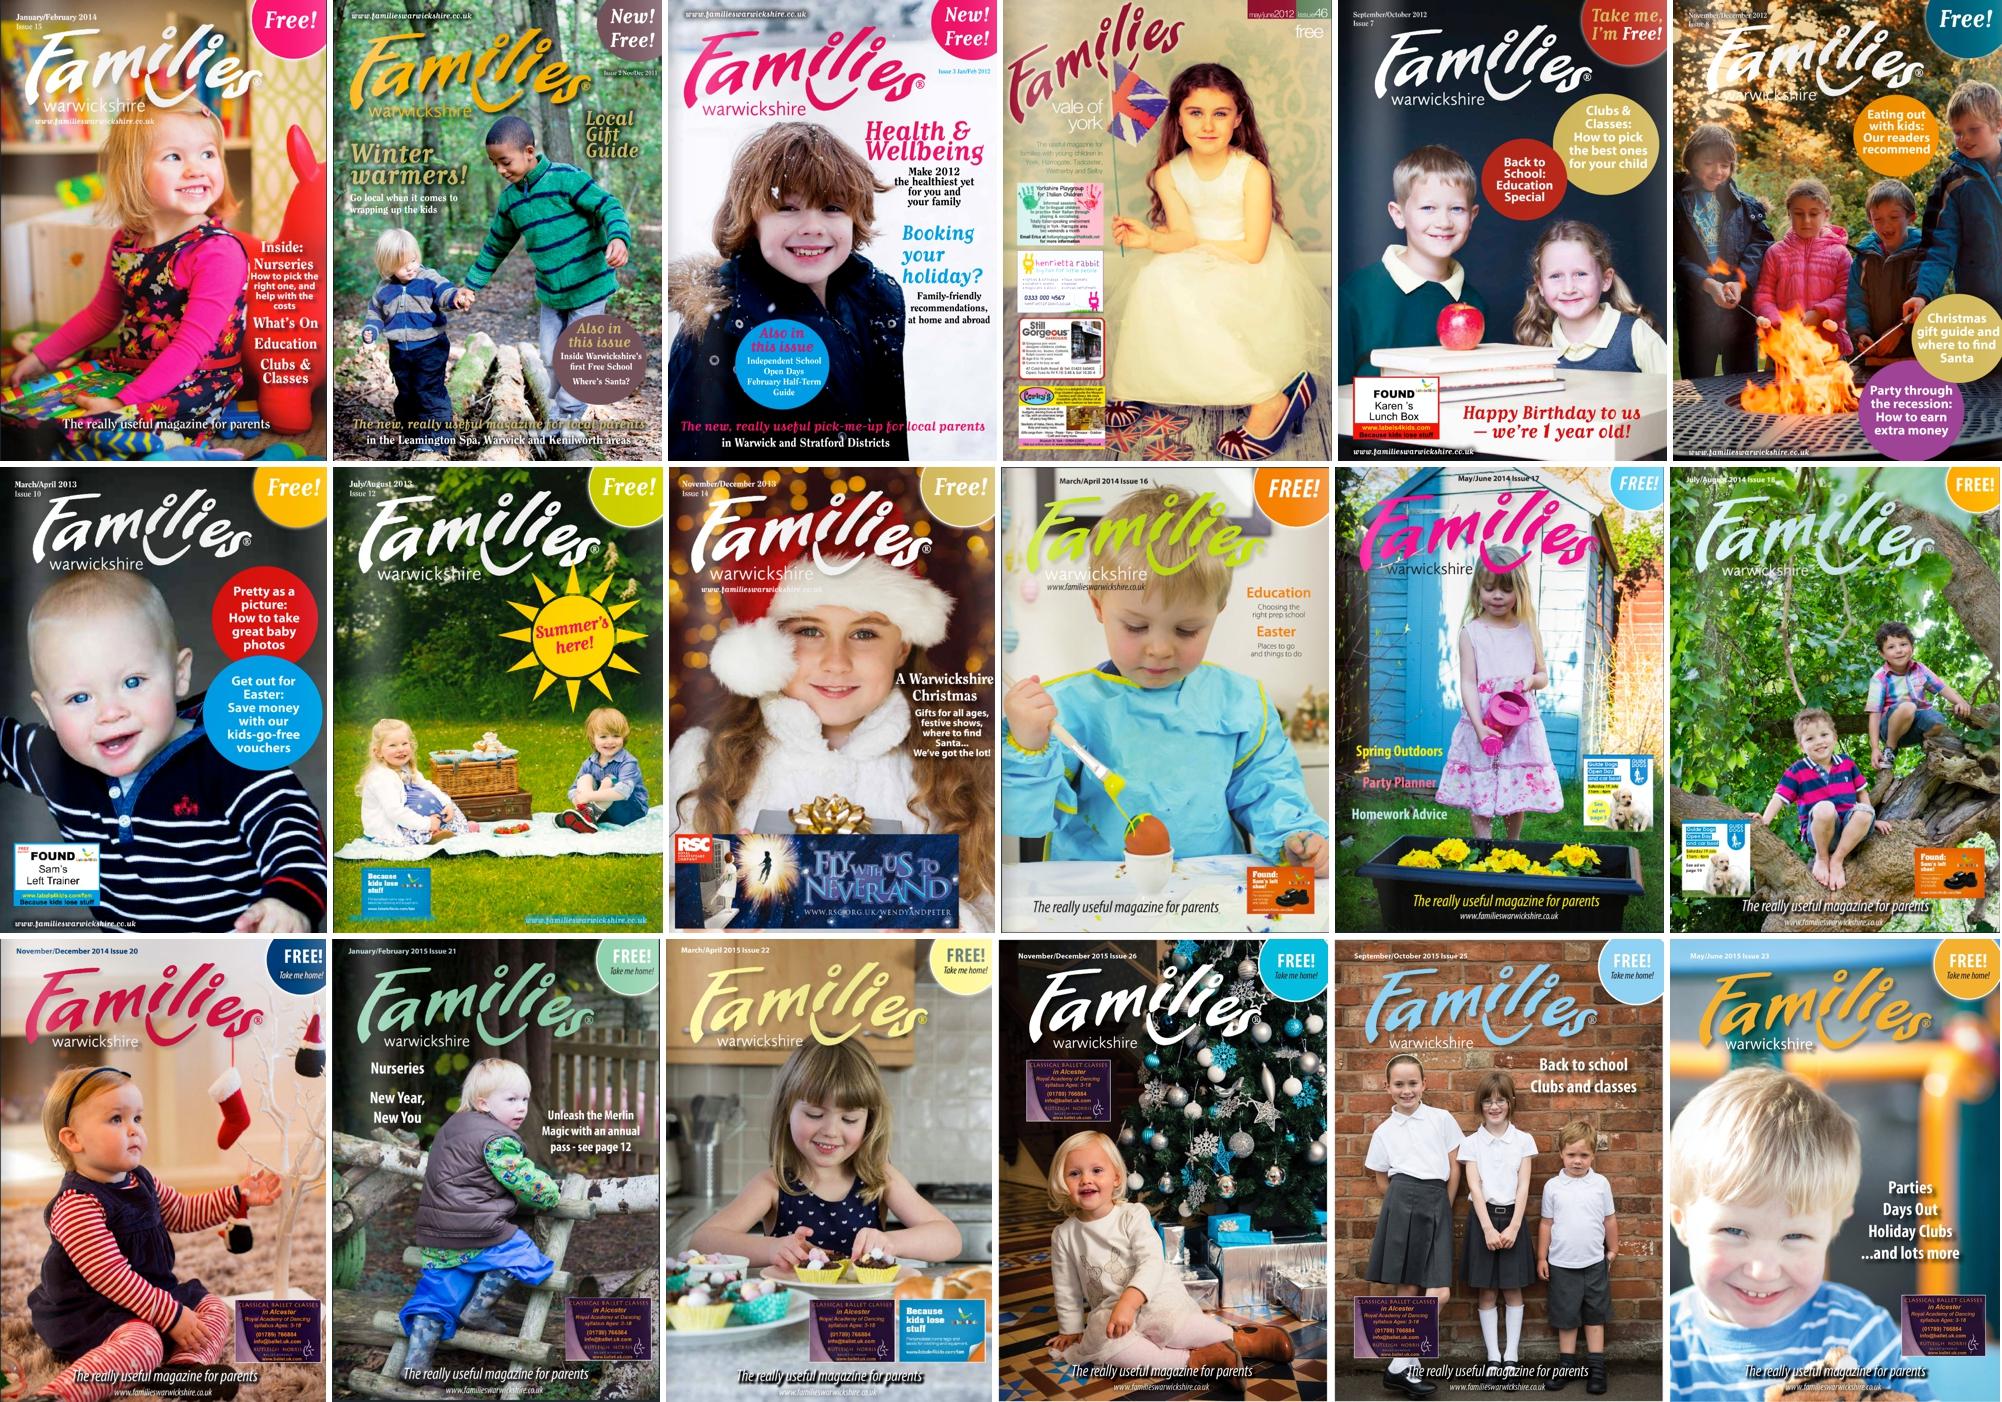 Families Warwickshire photographer